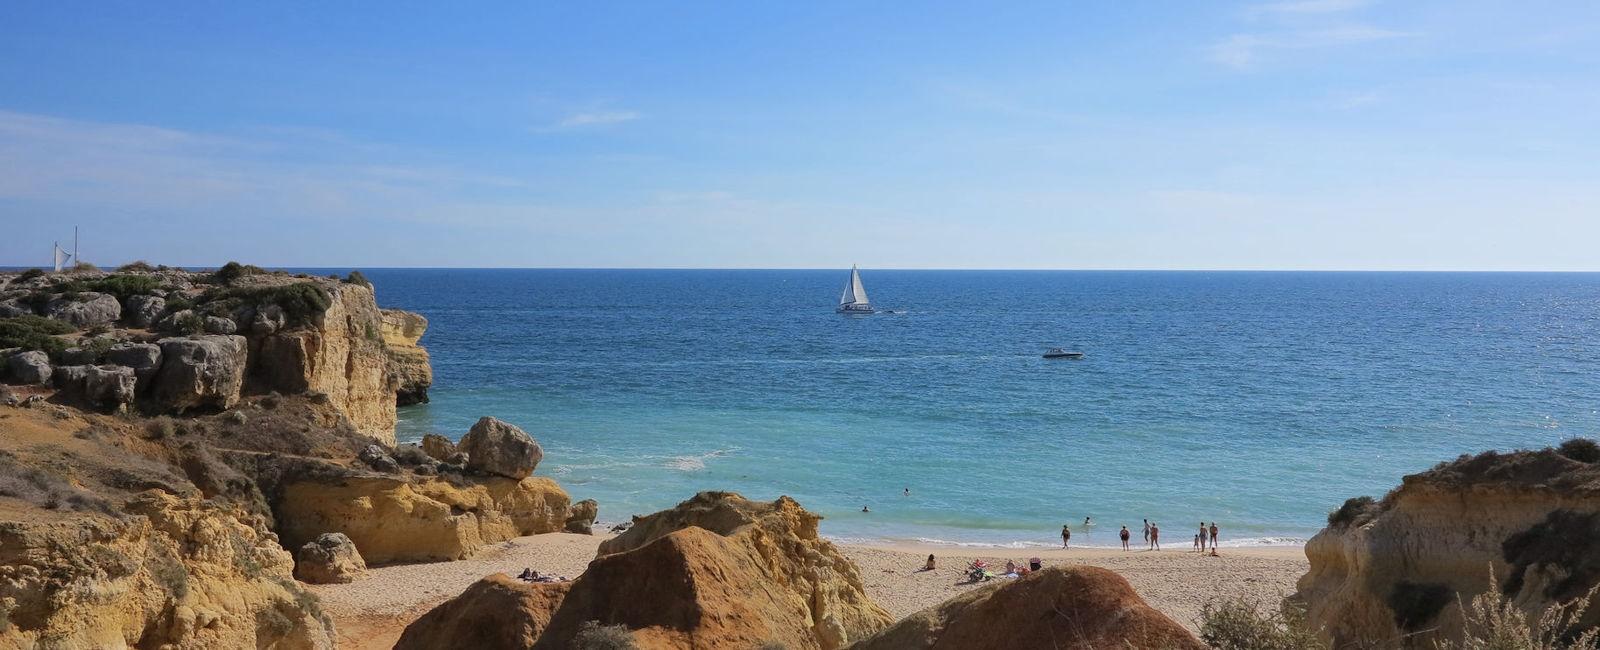 Luxury Praia da Falesia Holidays